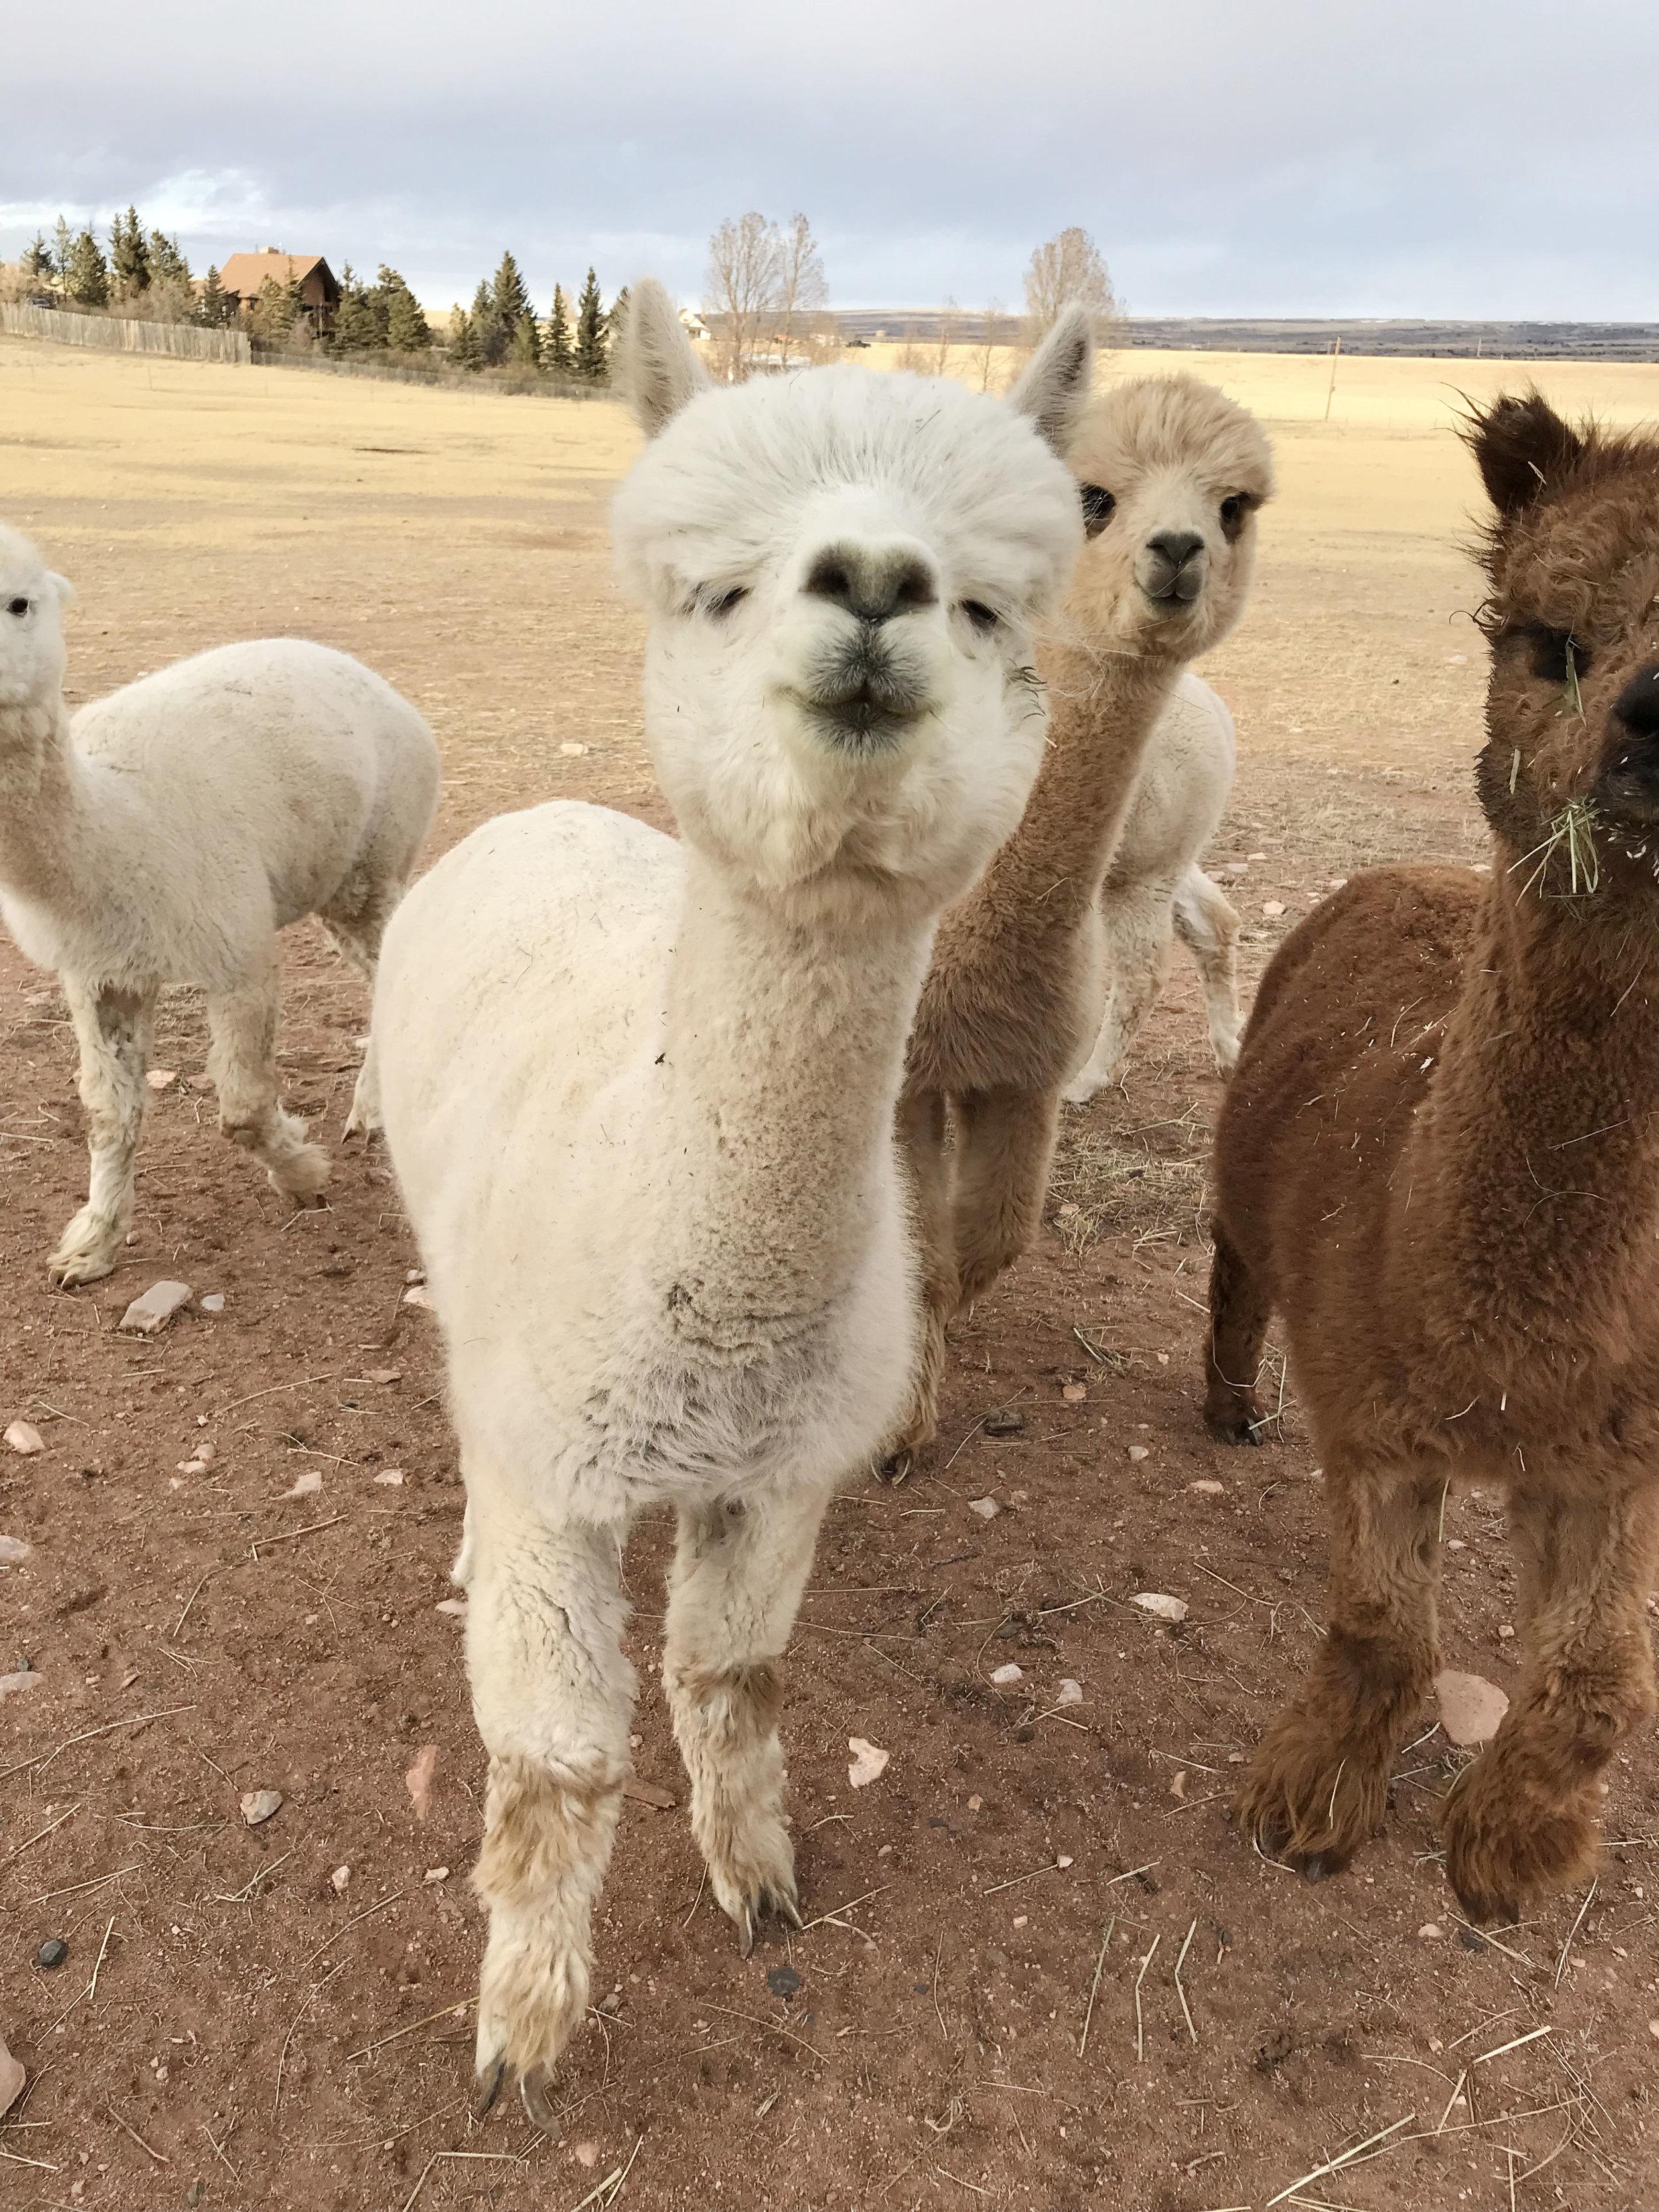 Filbert the alpaca